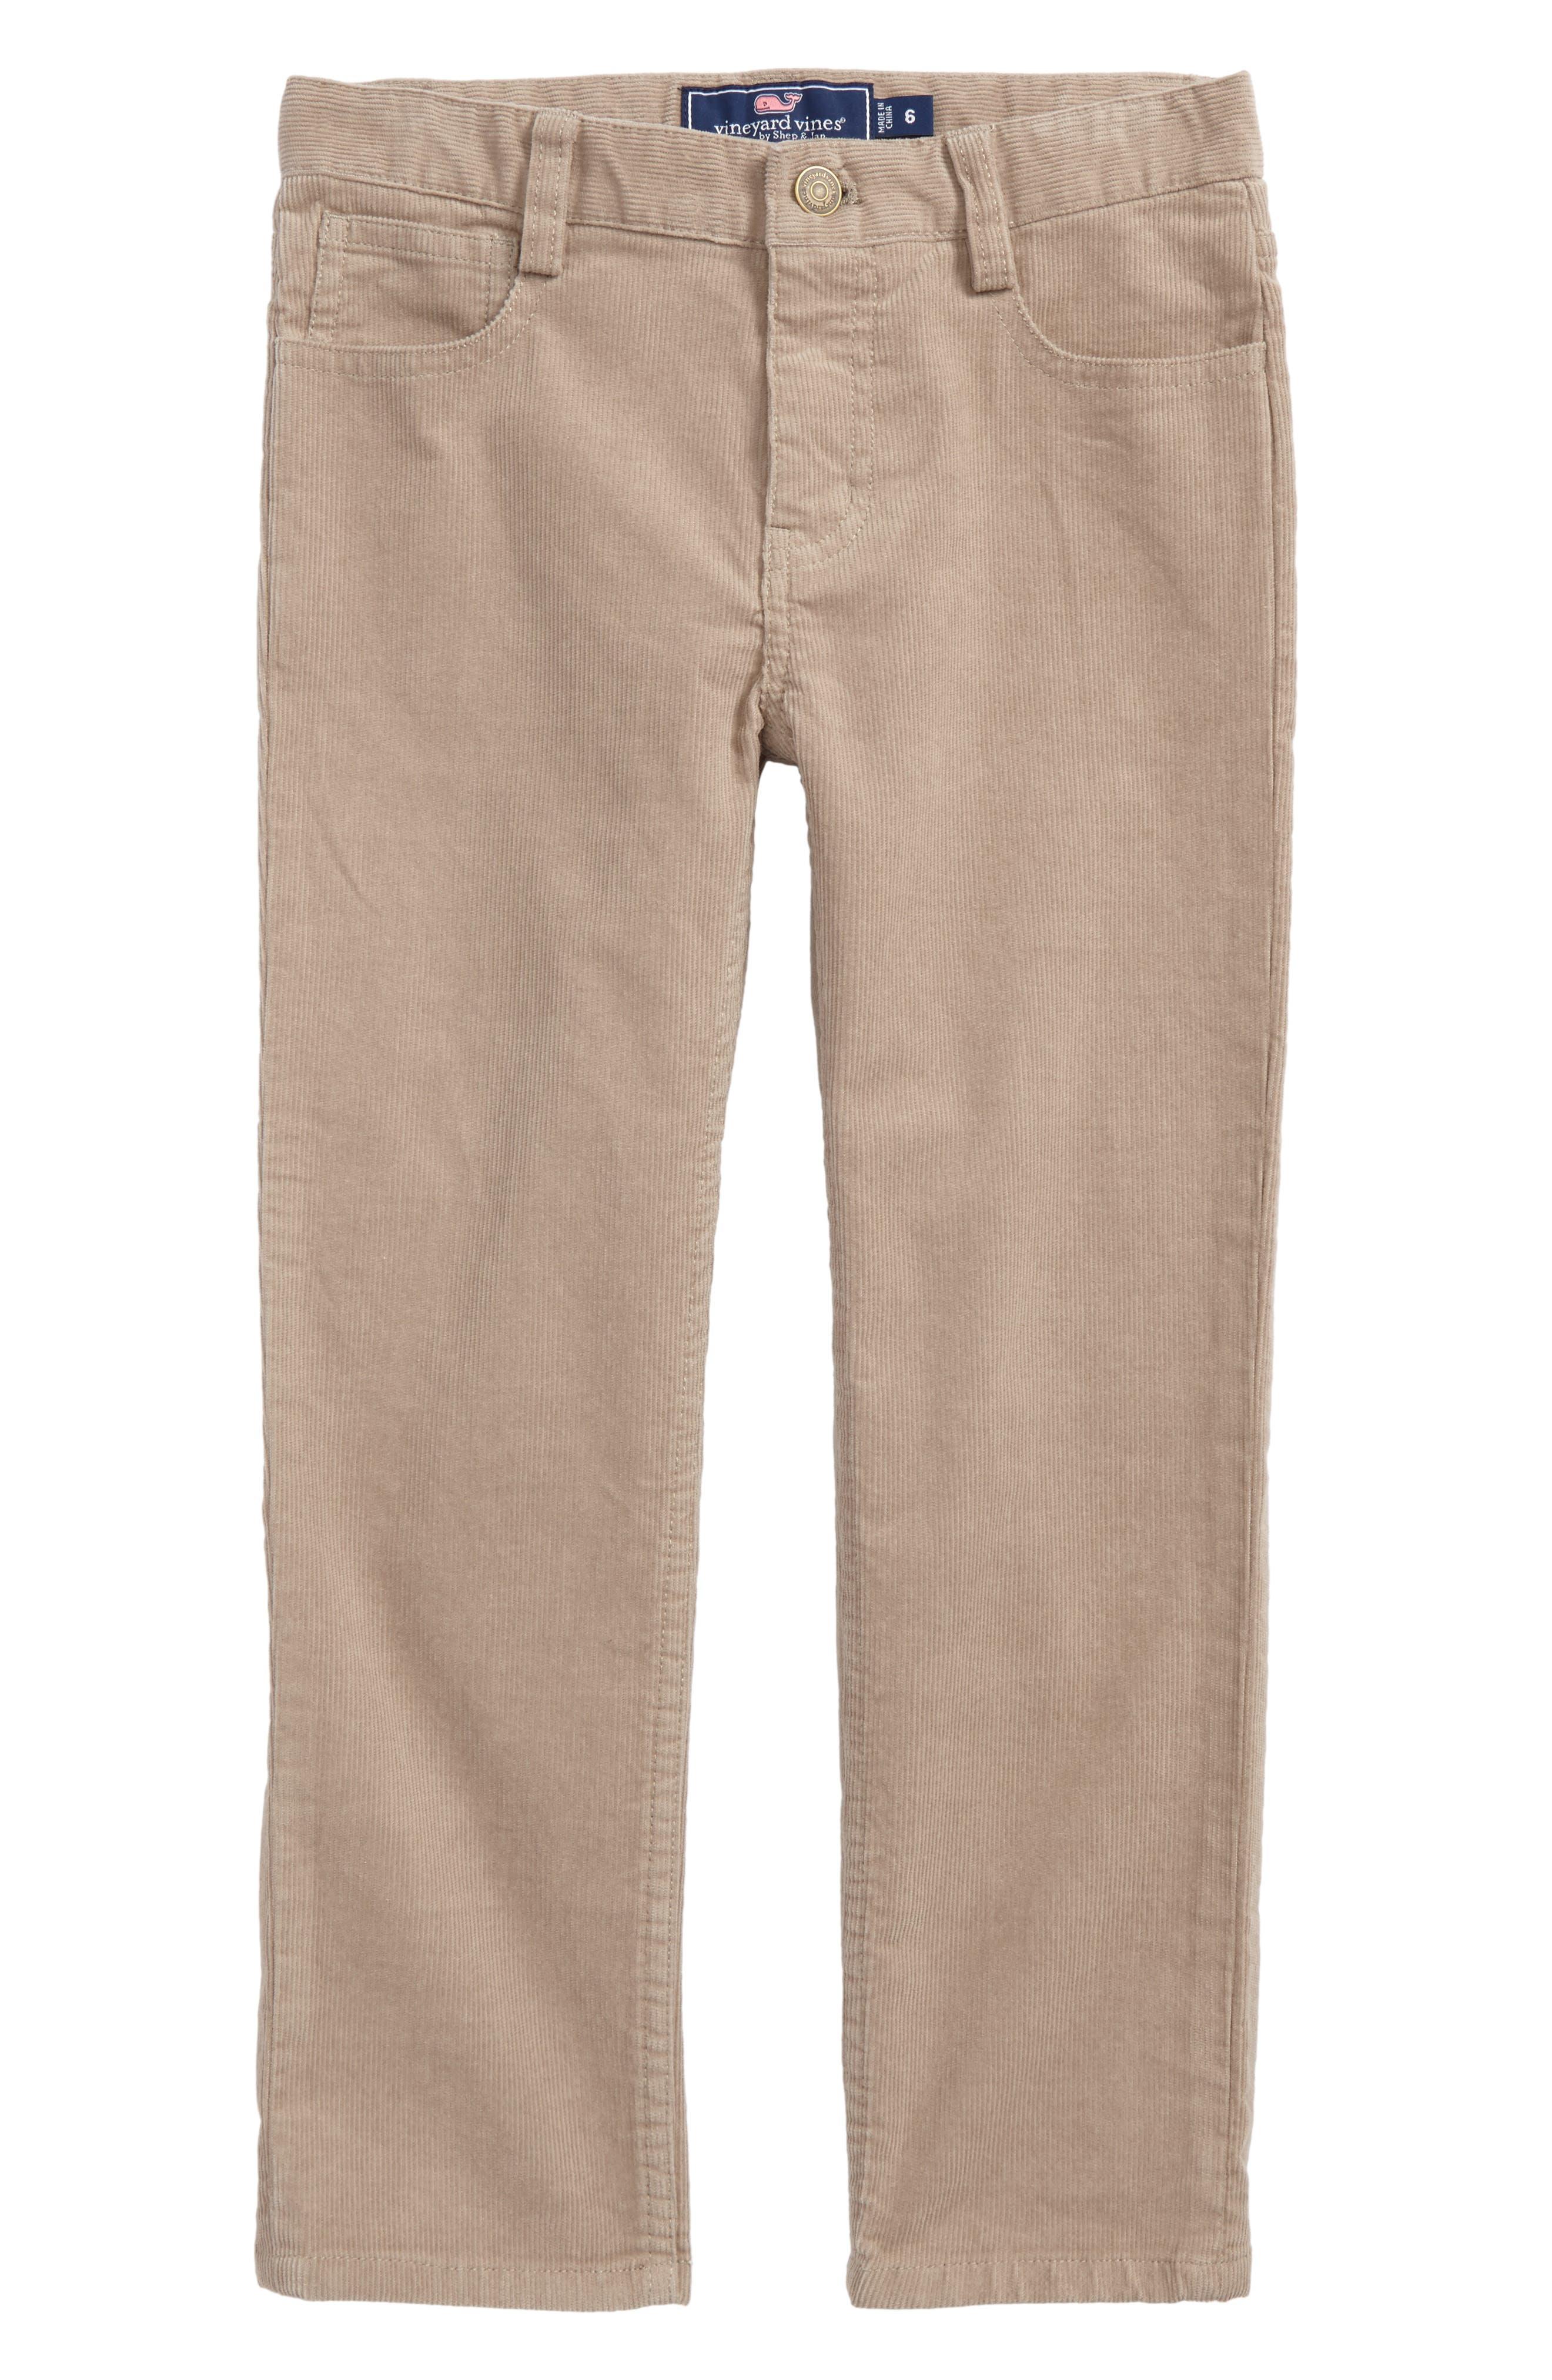 Corduroy Pants,                         Main,                         color, Khaki